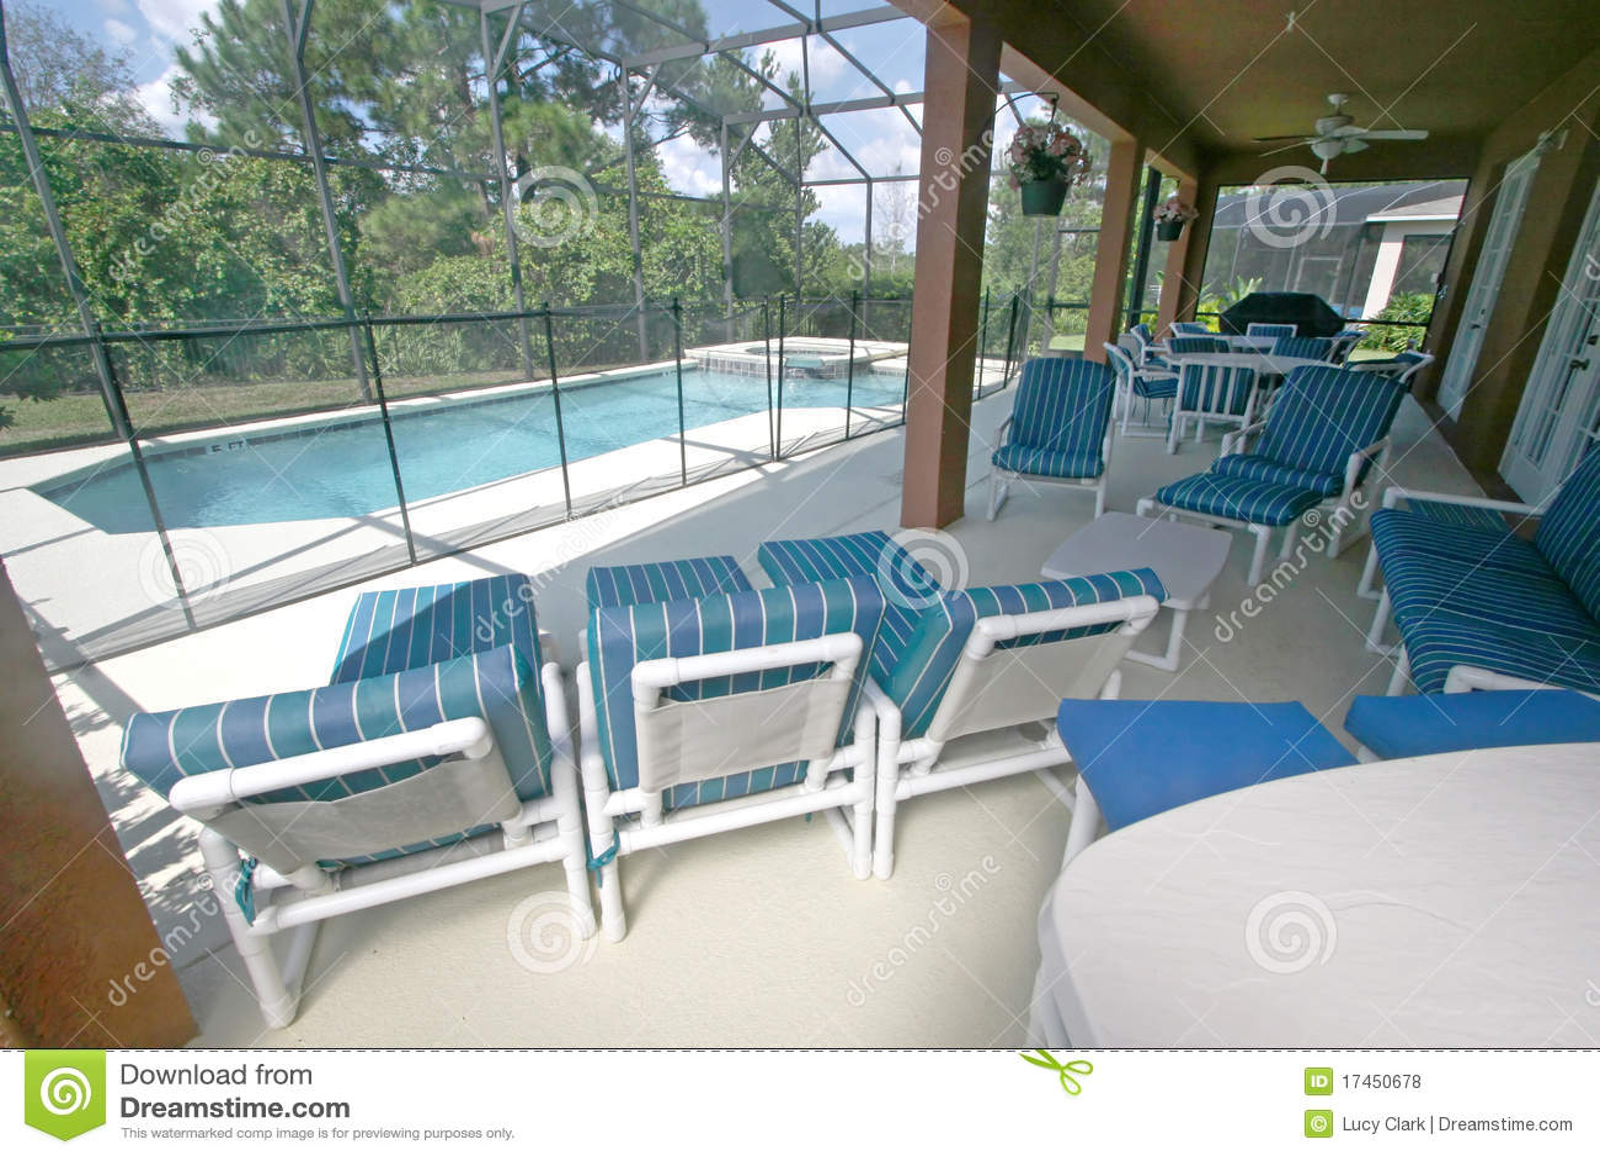 Lanai Pool And Spa Royalty Free Stock Photos Image